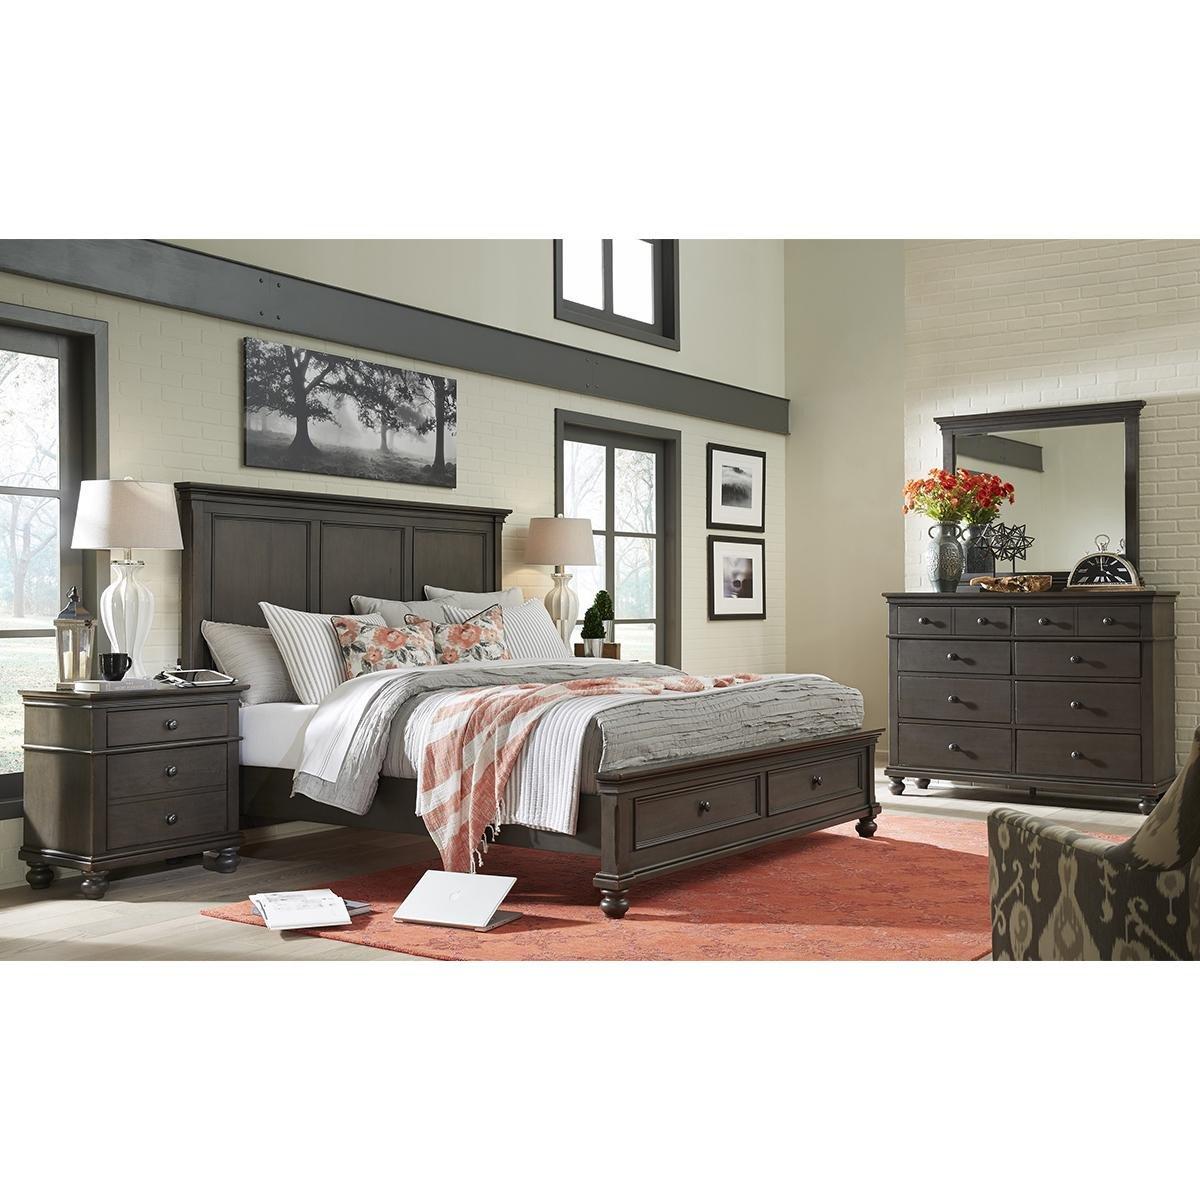 King Size Bedroom Suites Beautiful Riva Ridge Oxford 4 Piece King Bedroom Set In Peppercorn